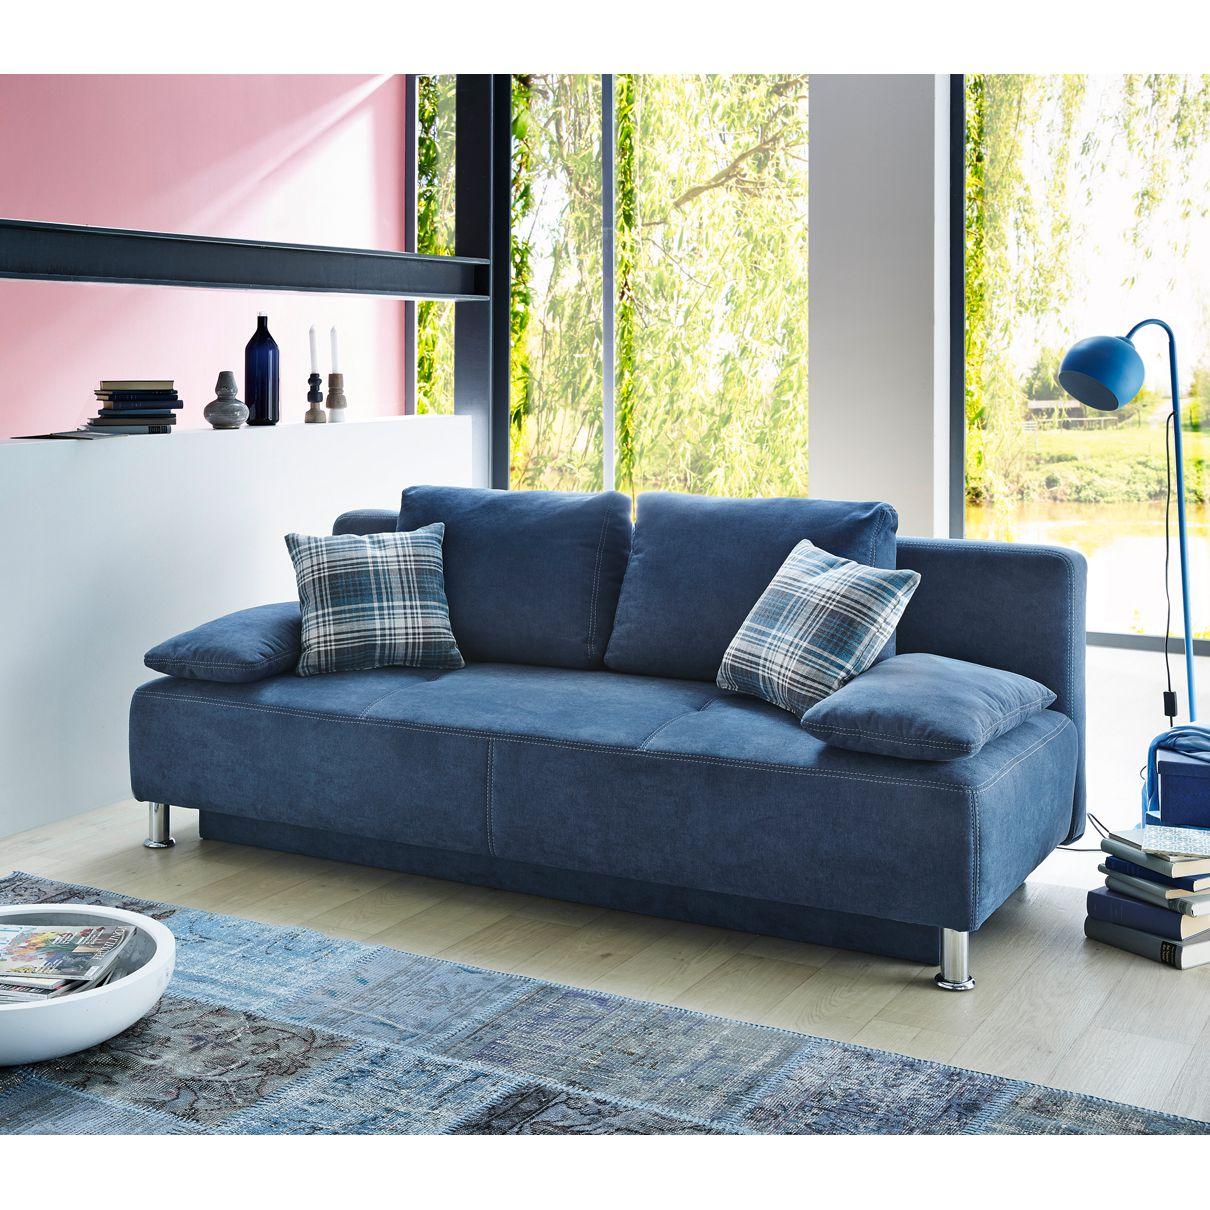 Schlafsofa Guam Wohnen Sofa